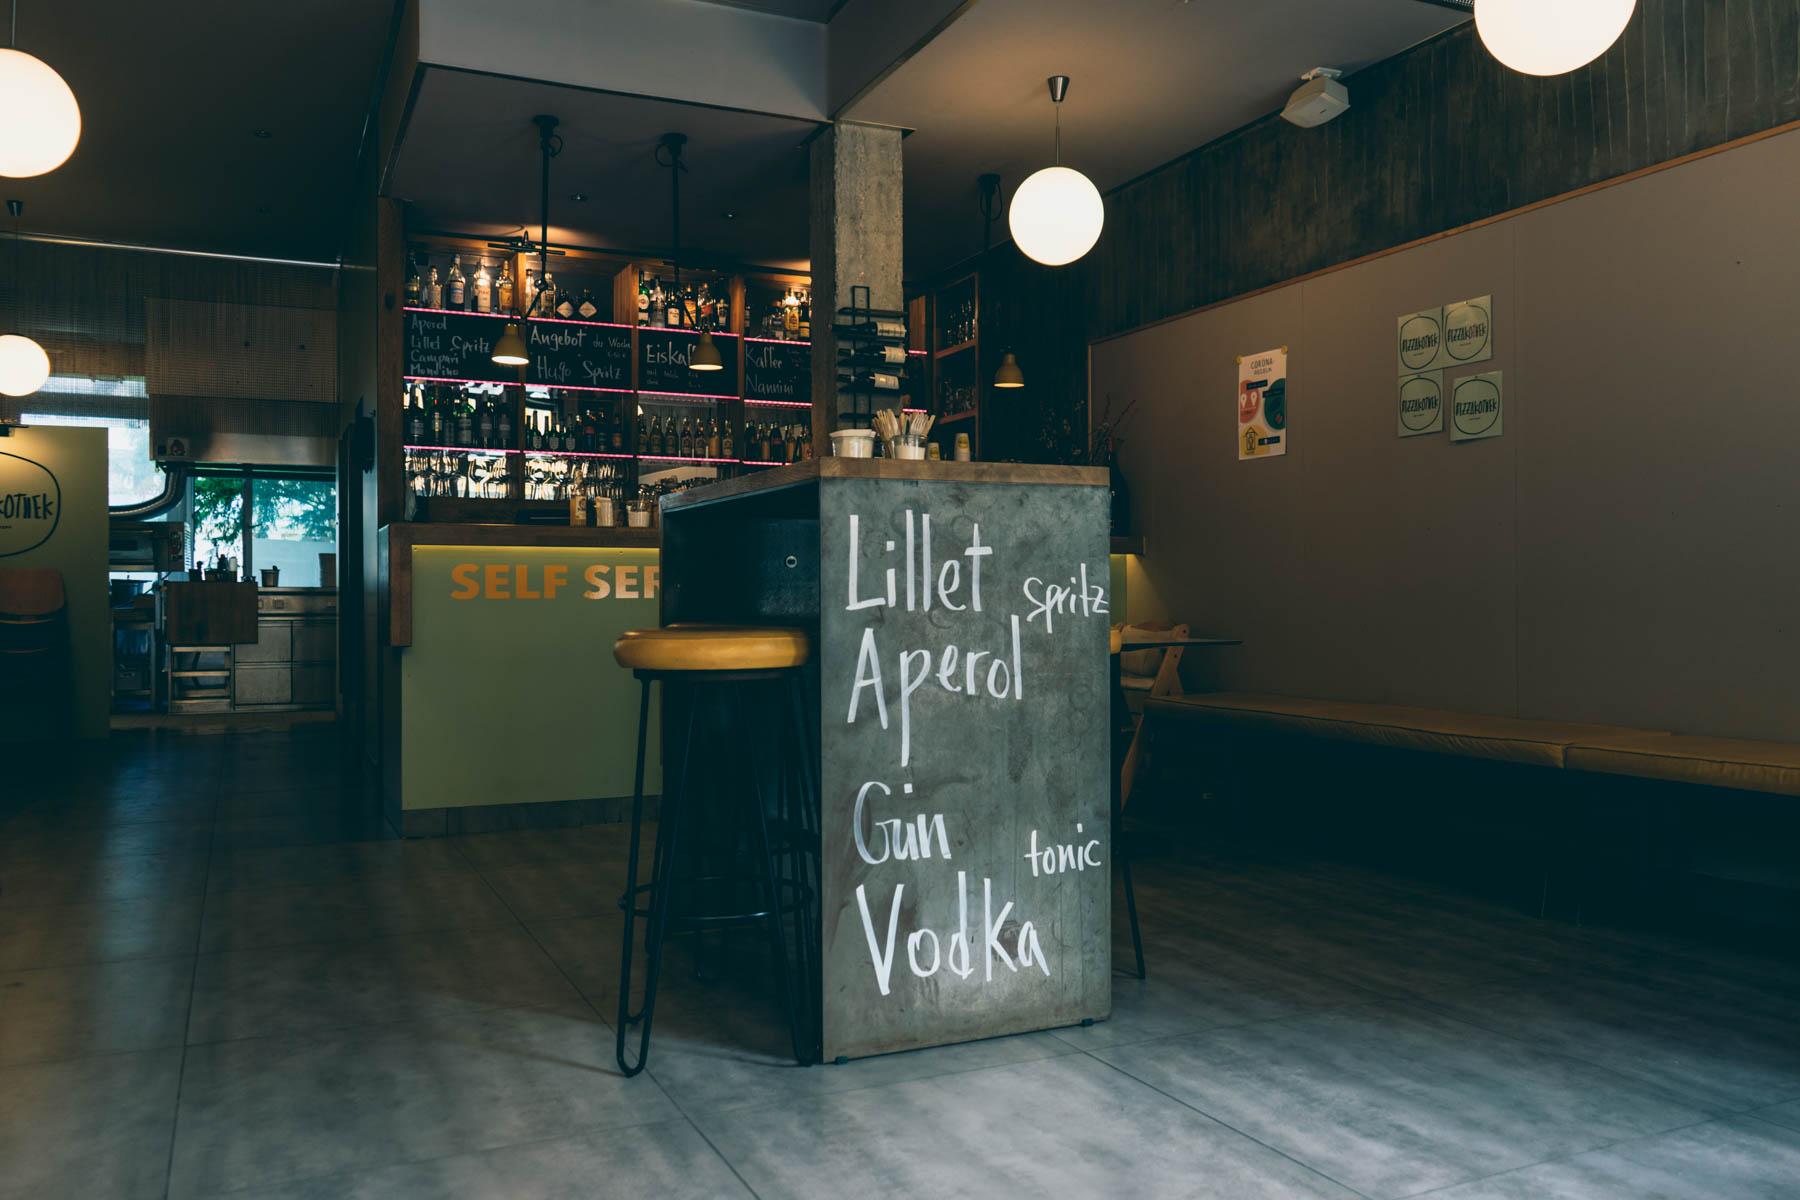 Geheimtipp Muenchen Restaurant Pizzakothek BS 03 – ©wunderland media GmbH